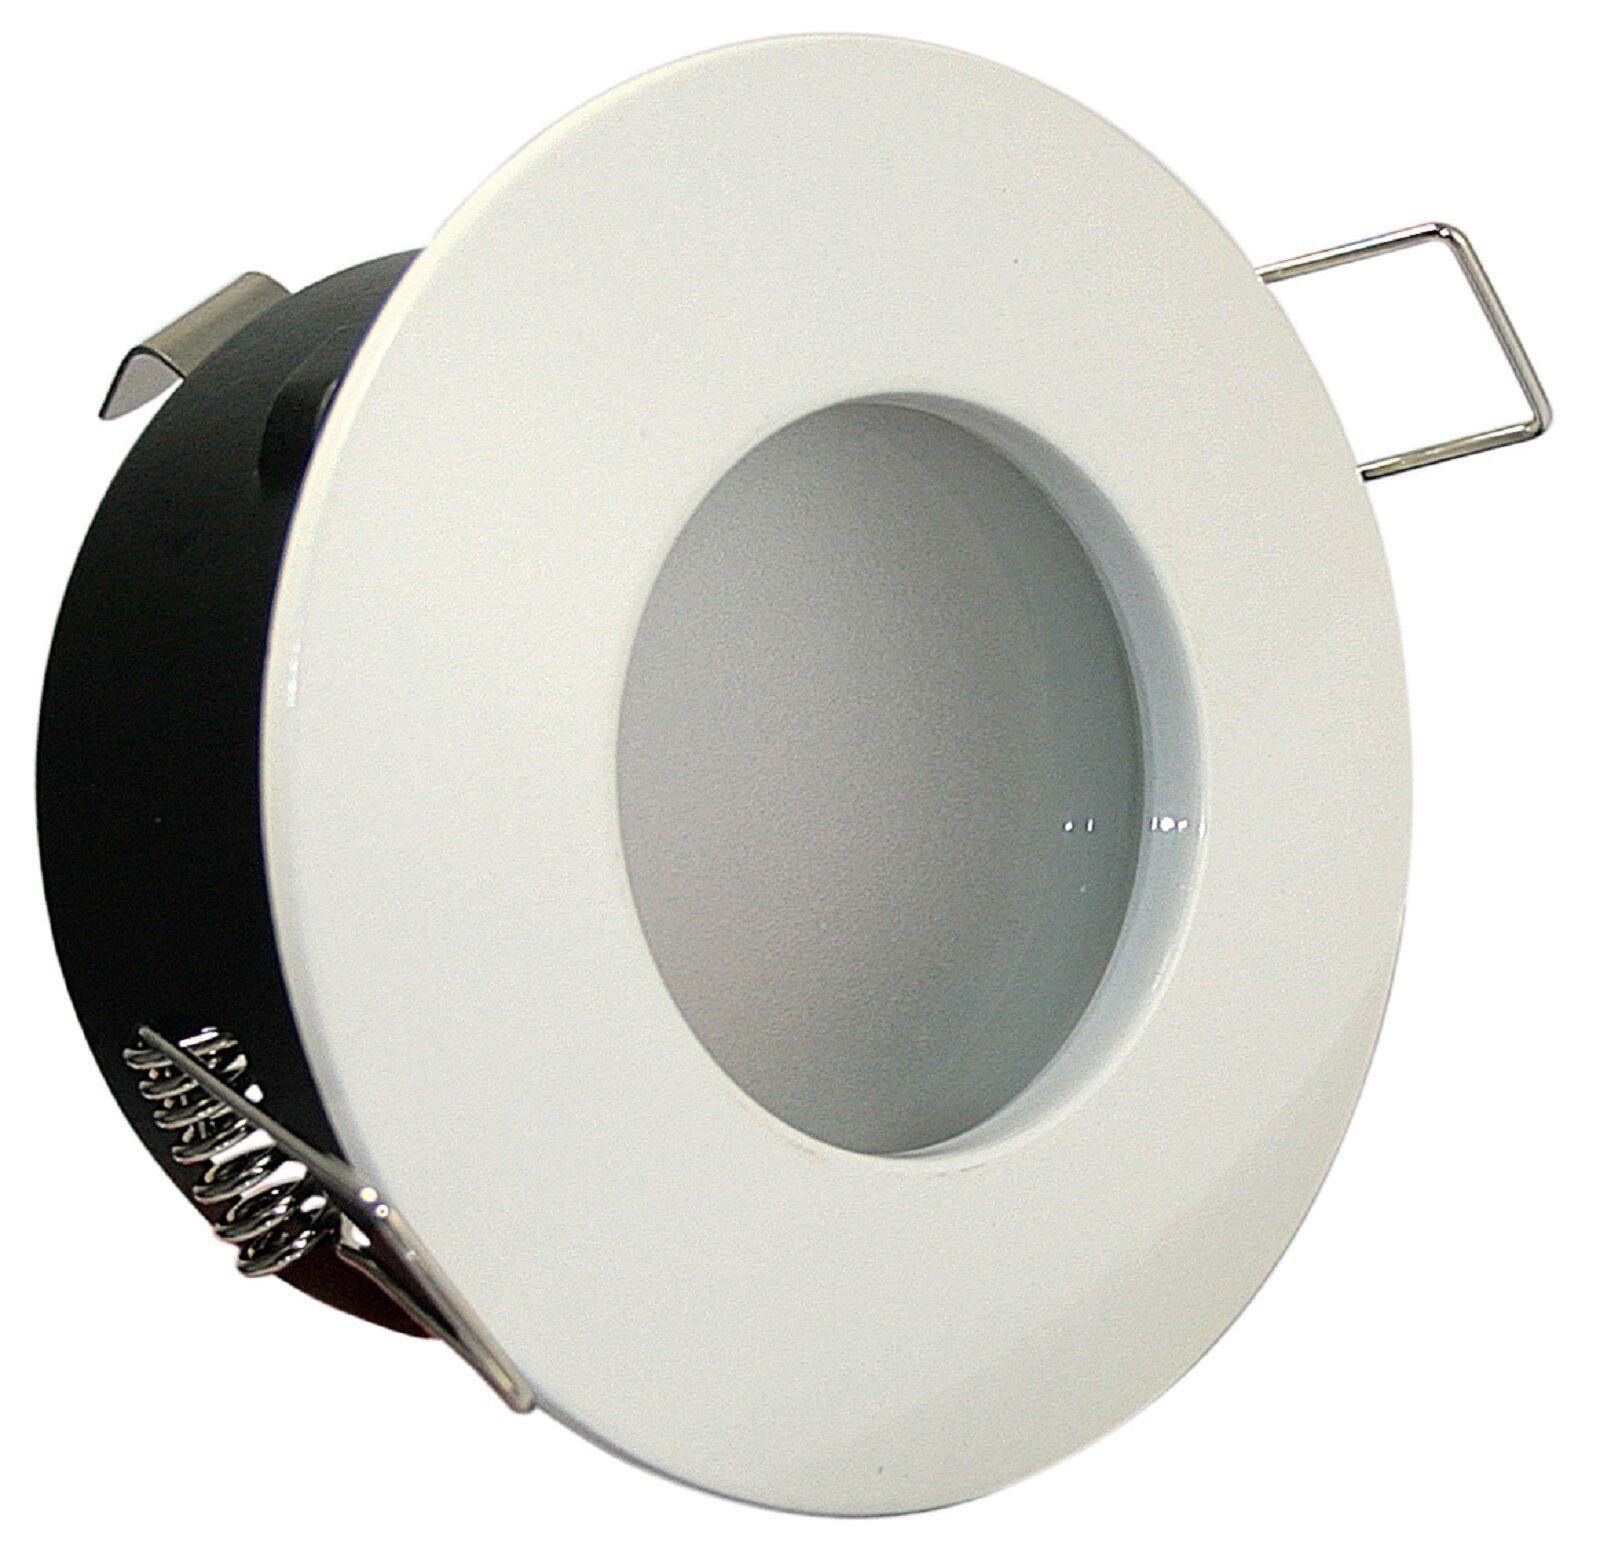 LED 230V Feuchtraum 7 Watt A+ GU10 Einbaustrahler DIMMBAR rund IP65